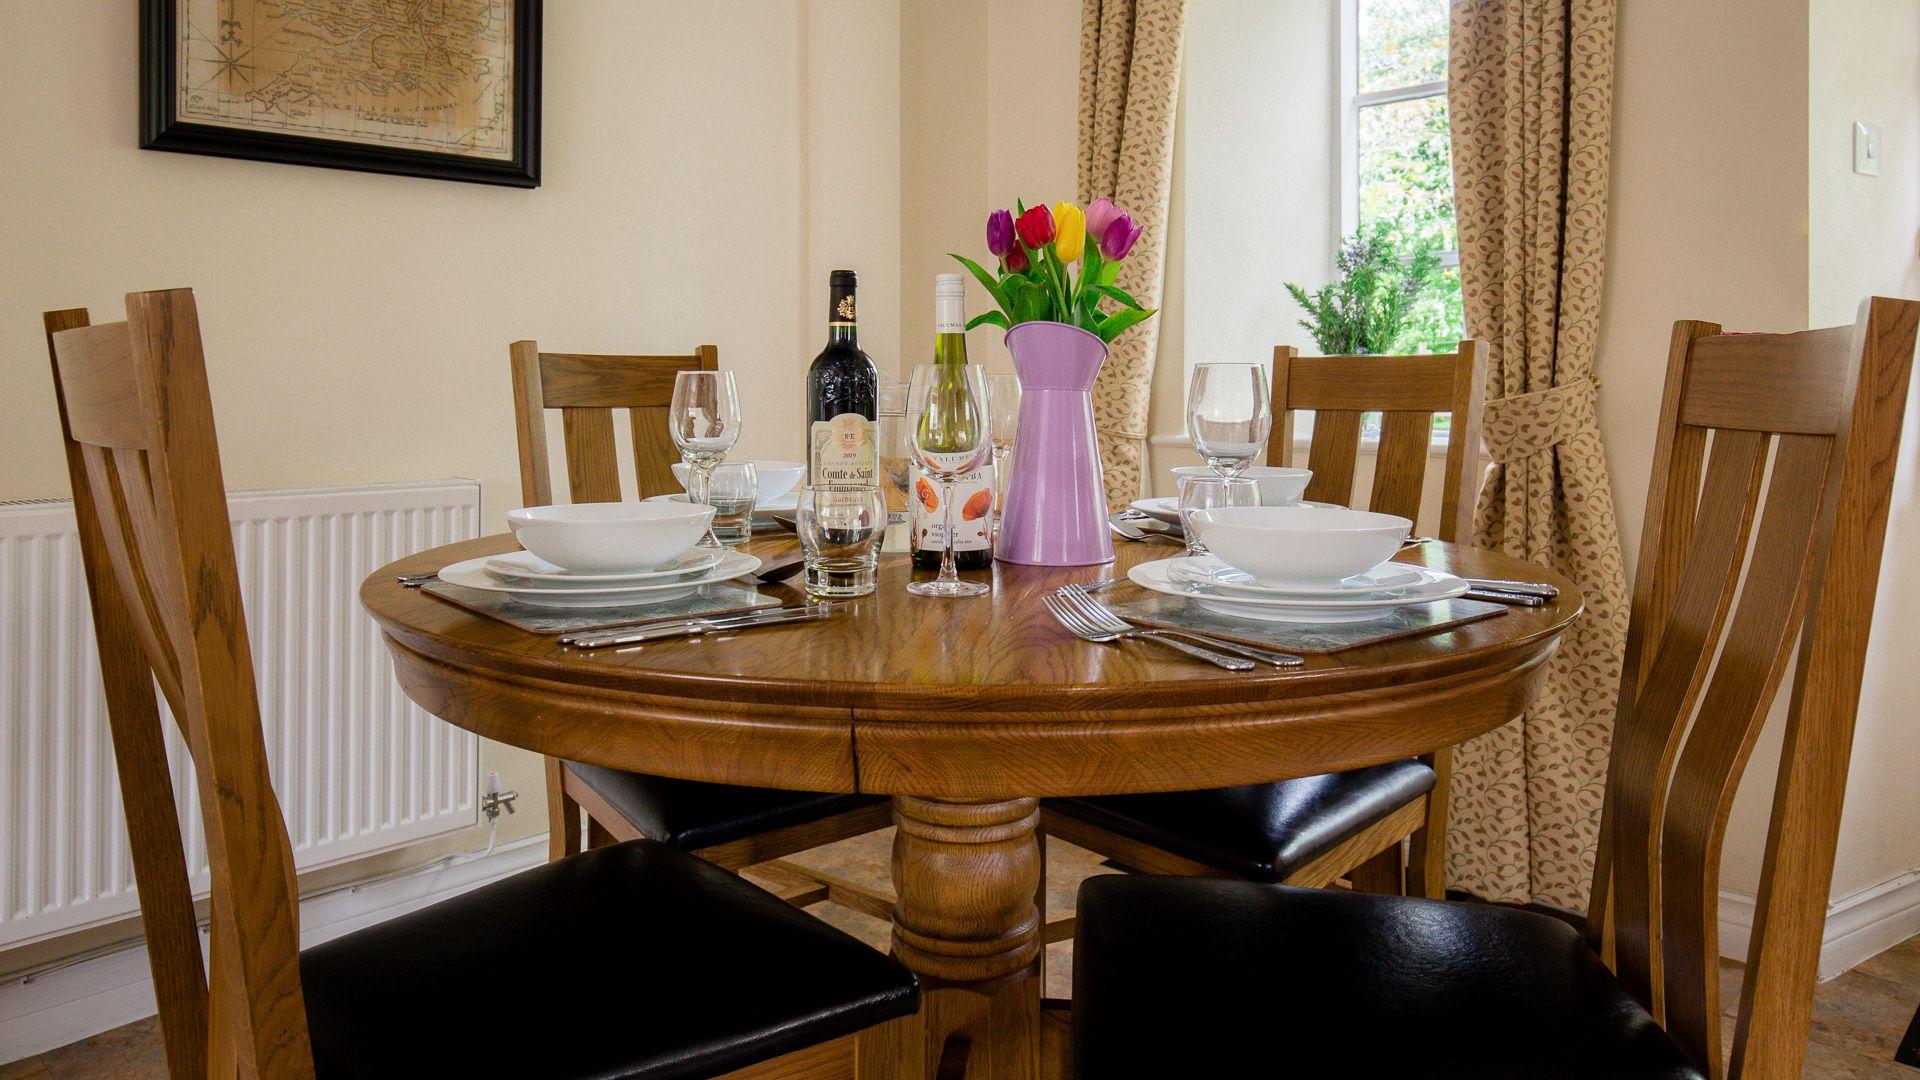 Dining Area, Prince Rupert at Sudeley Castle, Bolthole Retreats